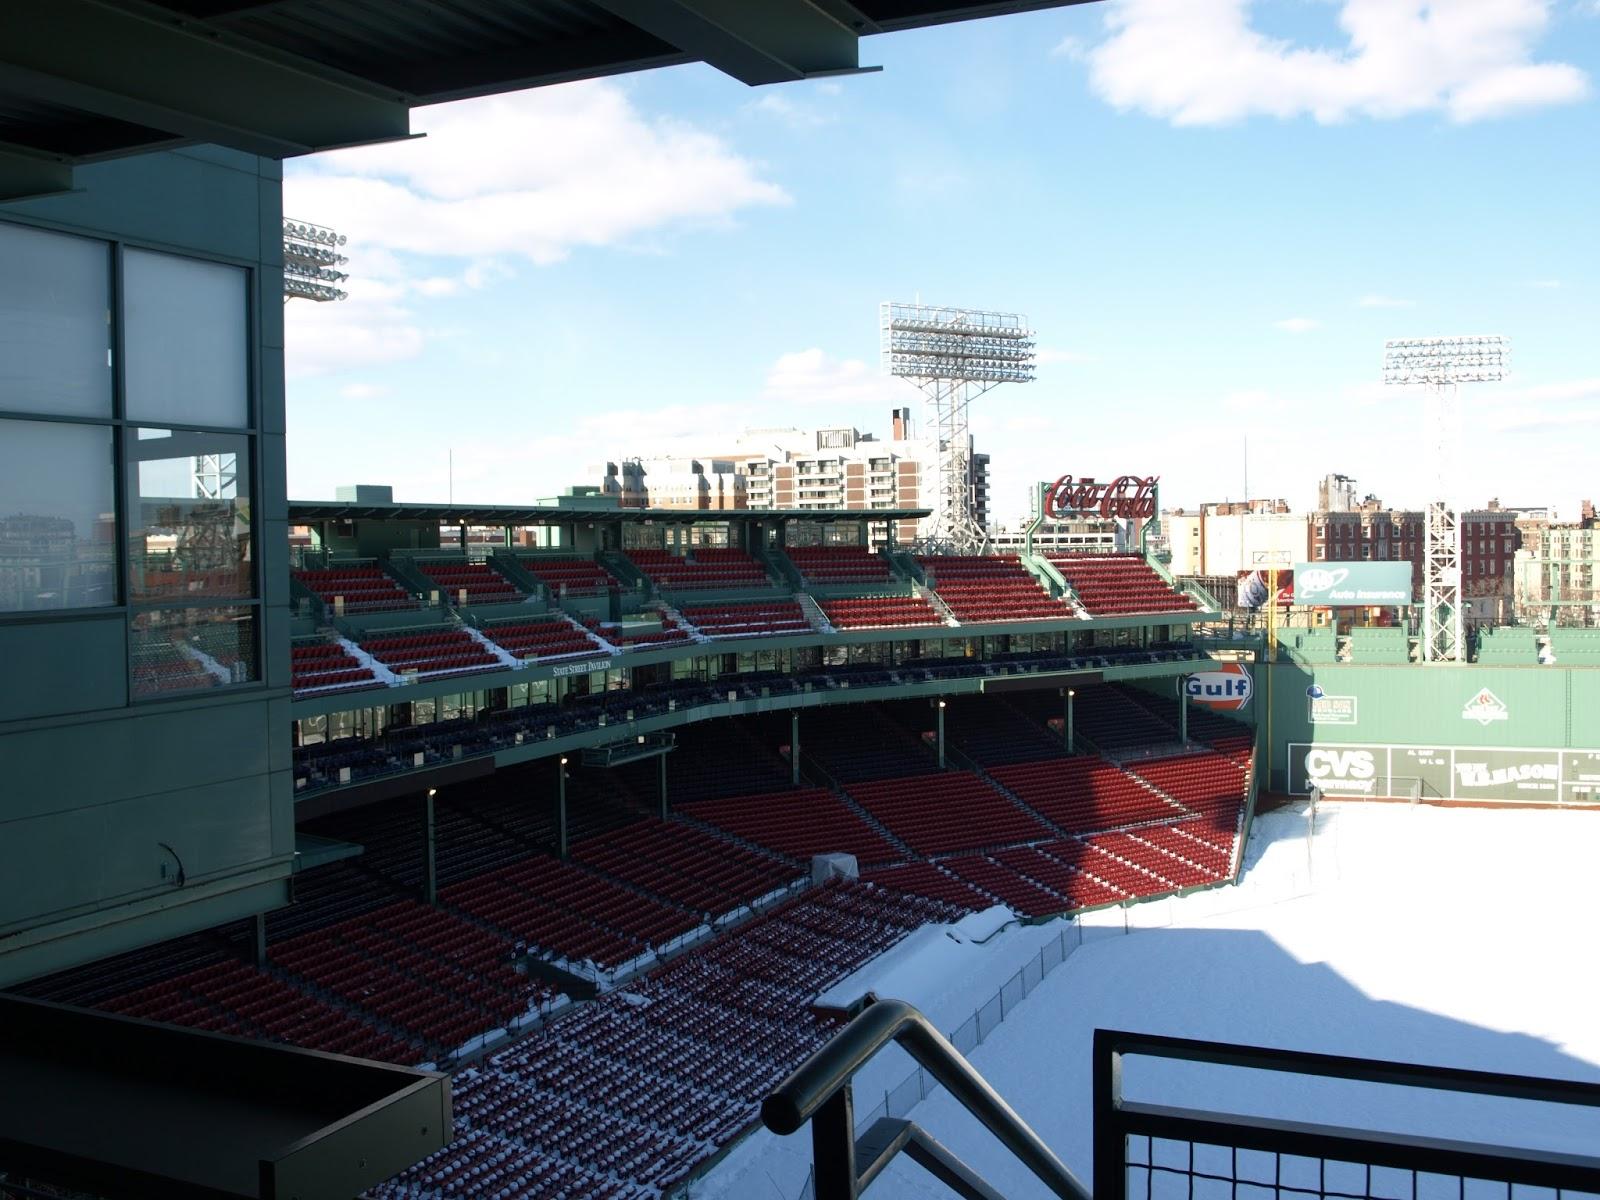 Boston, Red Sox, baseball, mlb, Fenway Park, Green Monster, tour, yawkey way, red seat, world series, babe ruth, tourist, travel, travelling, Massachusetts, MA, dropkick murphys, history, 1912,